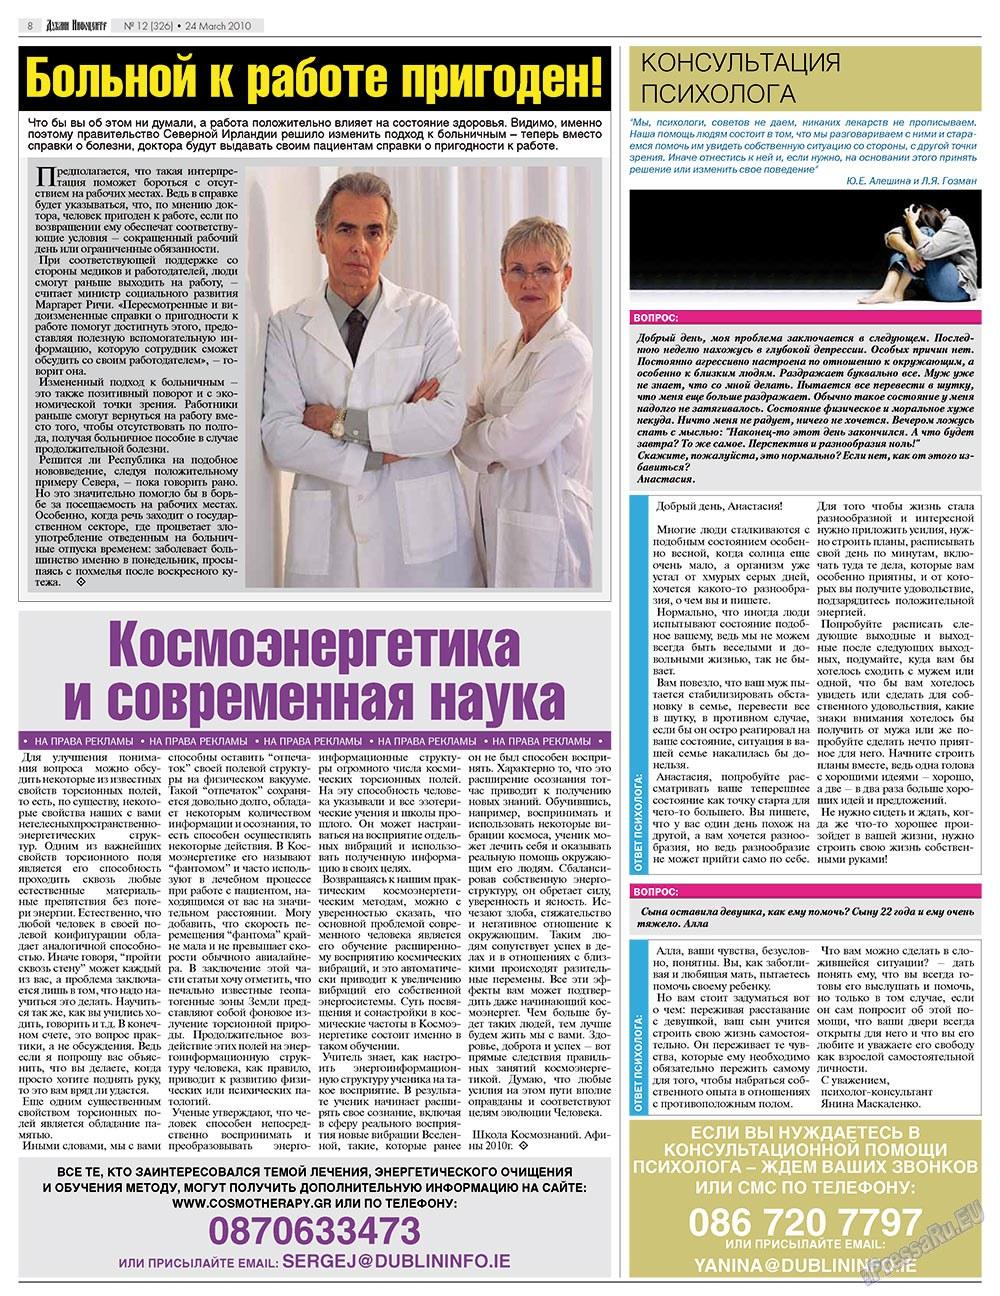 Дублин инфоцентр (газета). 2010 год, номер 12, стр. 8